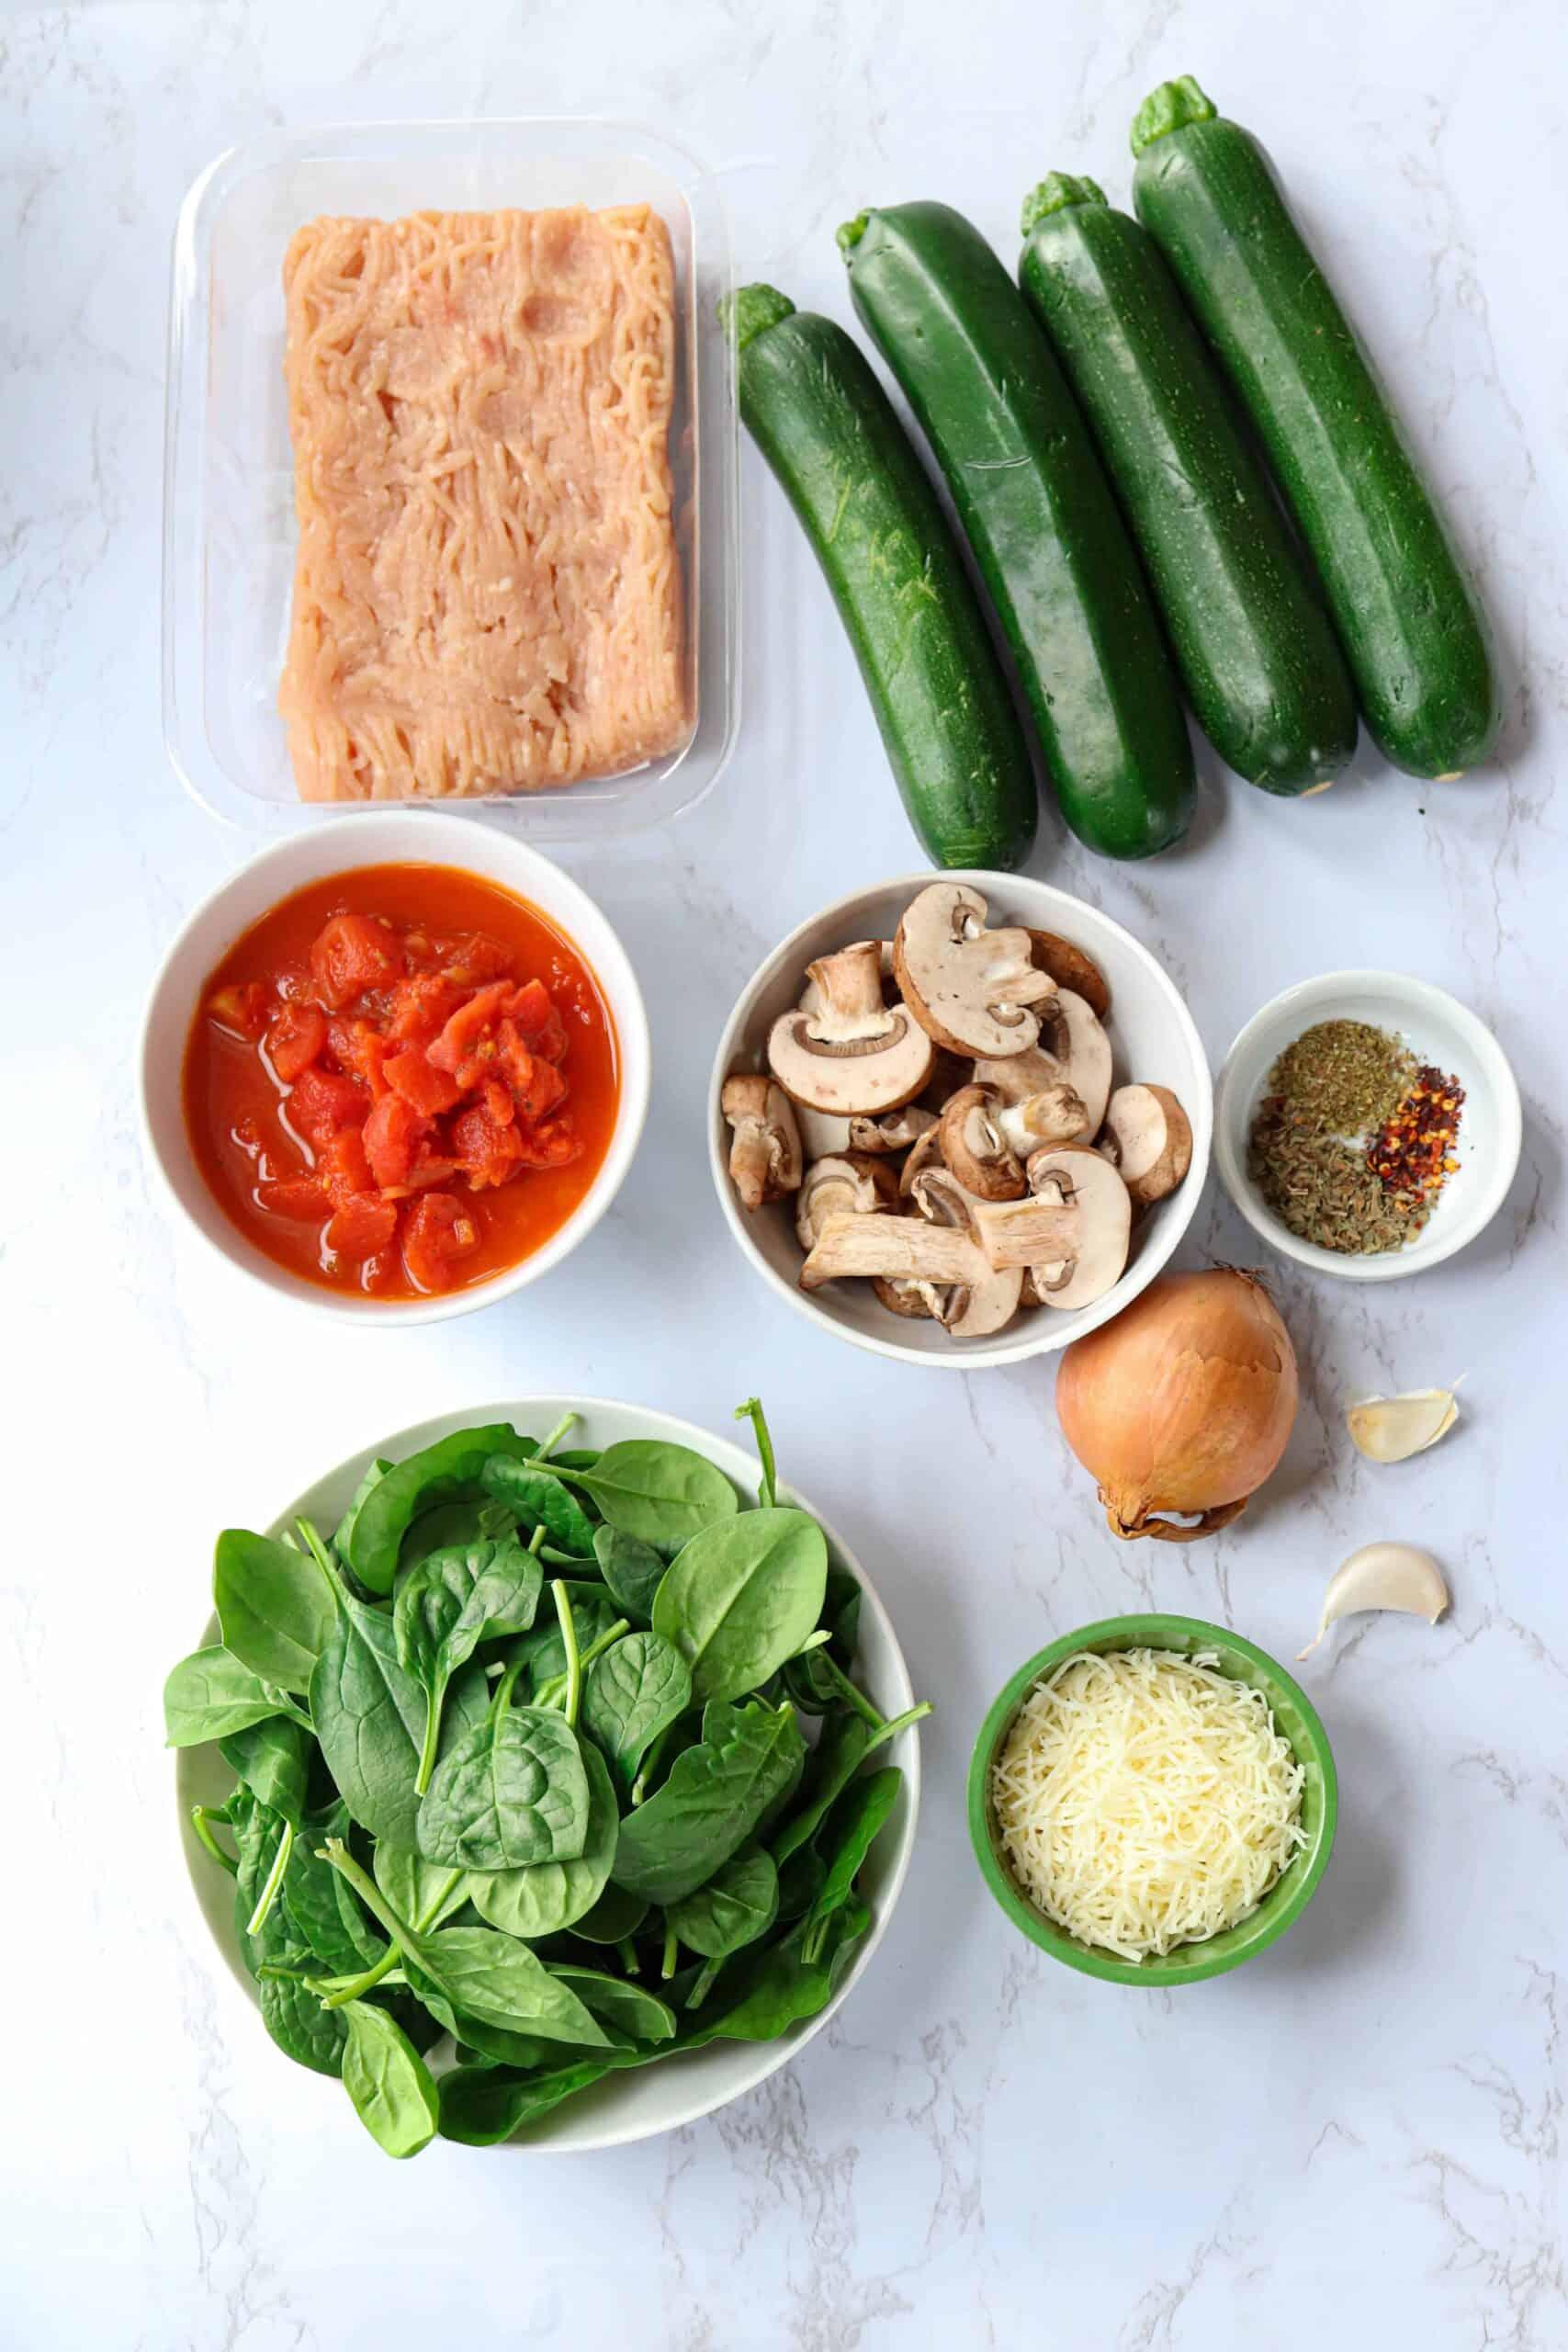 ground chicken, fresh spinach, mushrooms, four zucchini, spices, cheese, onion and garlic